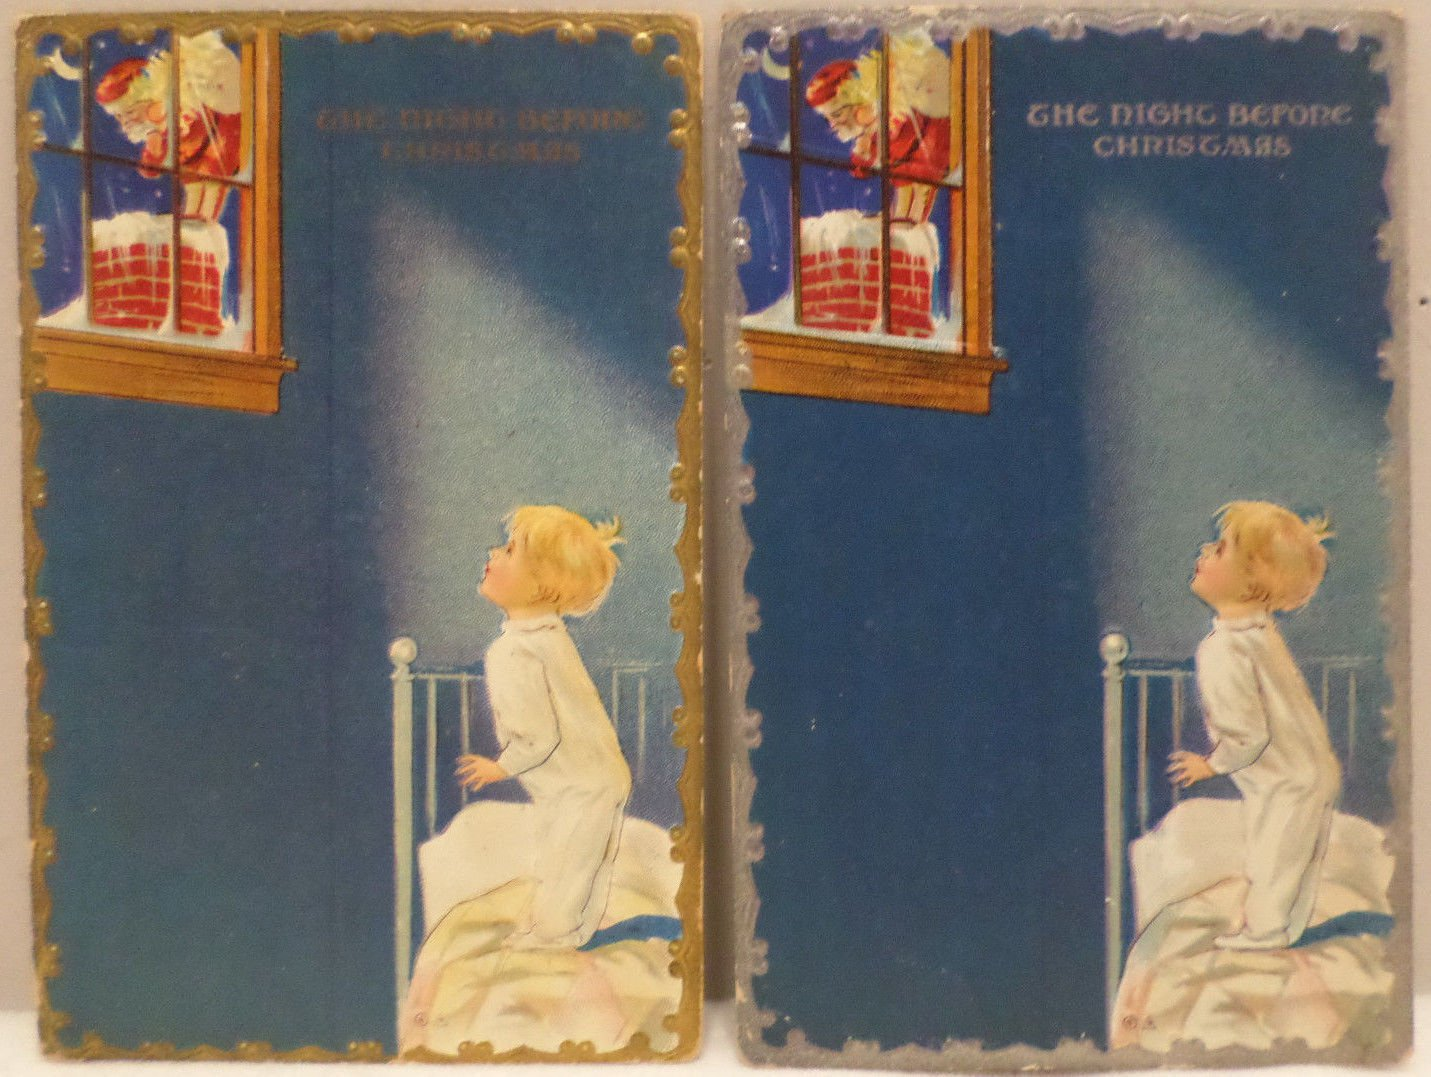 Antique Christmas postcards Santa Claus night before Christmas series 1910